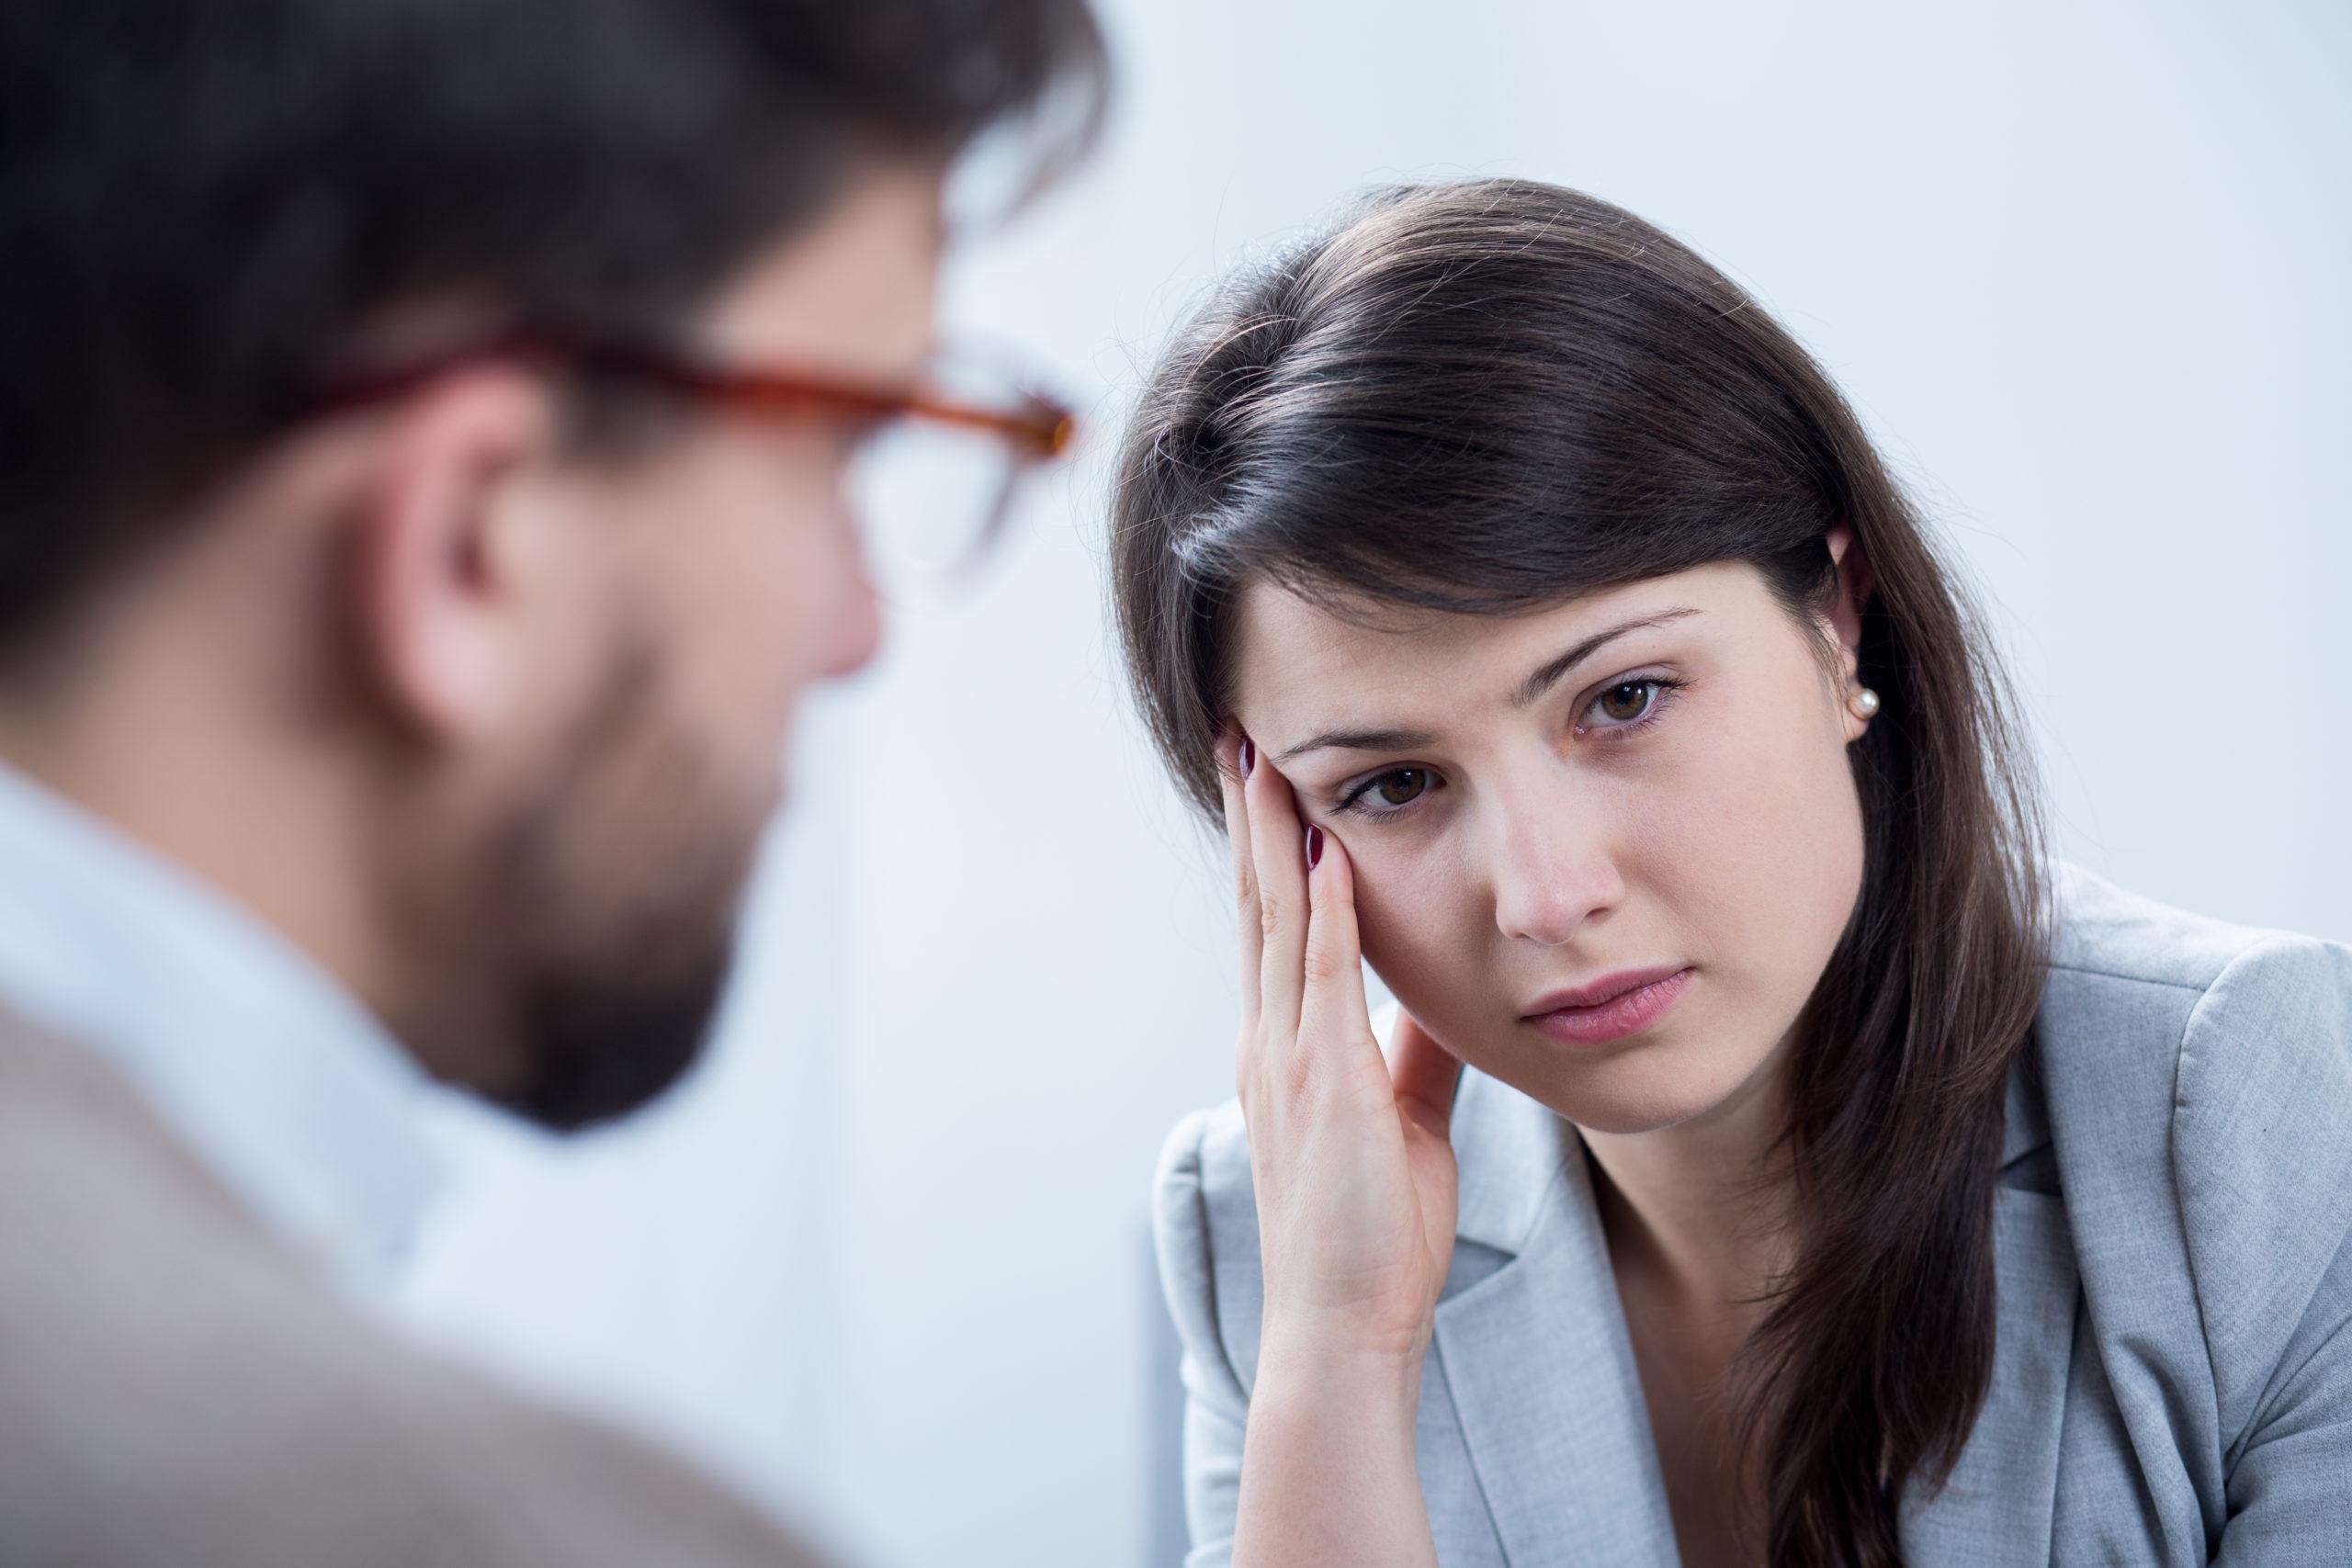 How to Prevent Compassion Fatigue